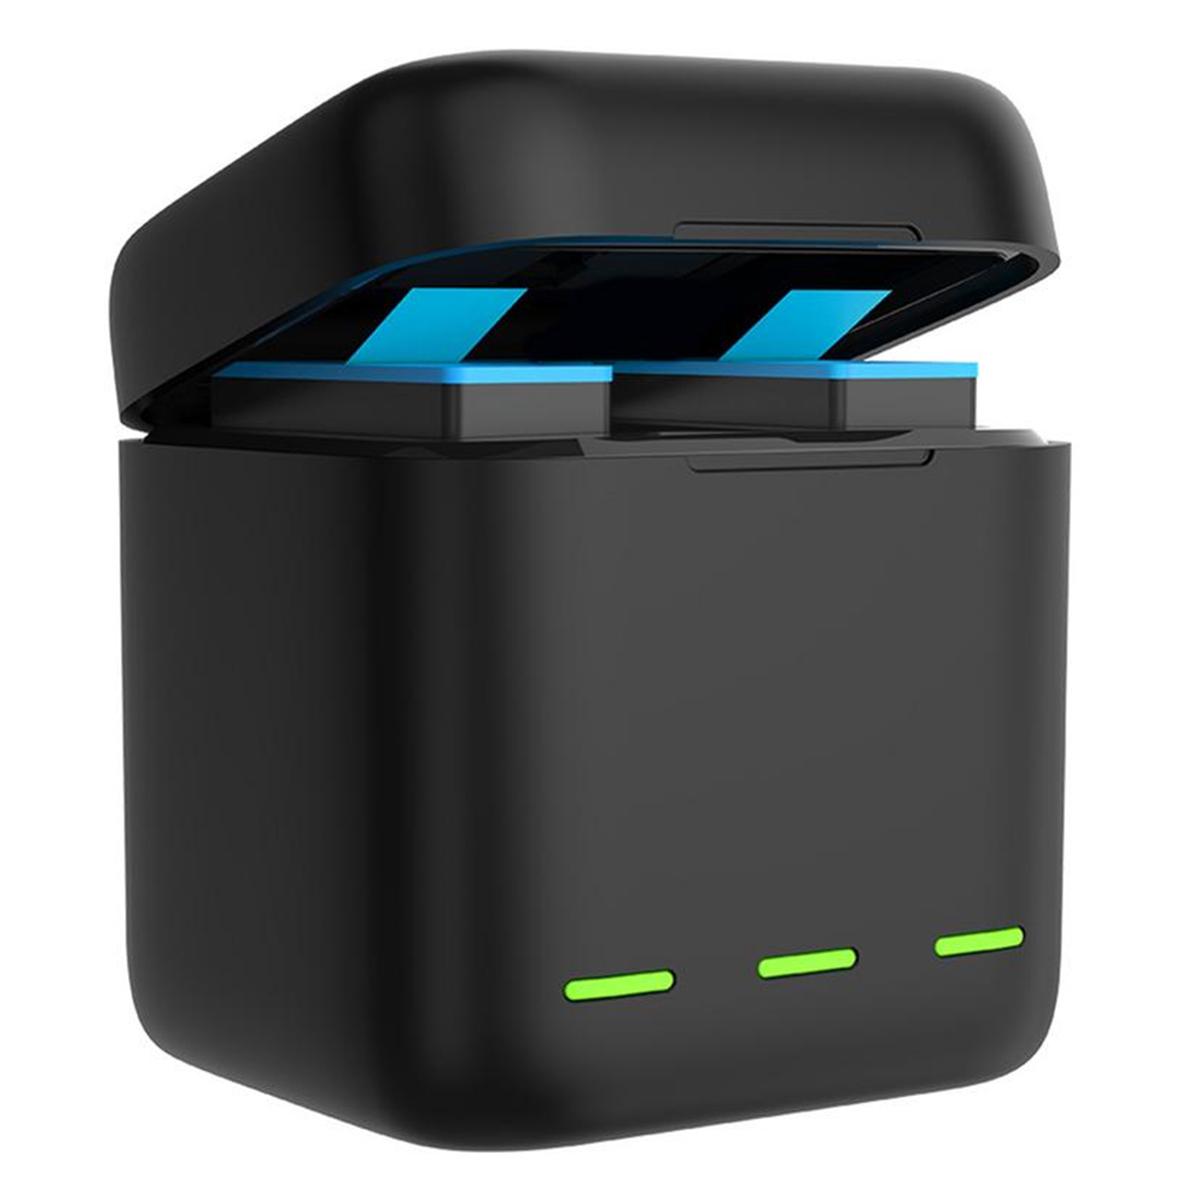 Kit Carregador Triplo com Duas Baterias - GoPro Hero9 Black - Telesin